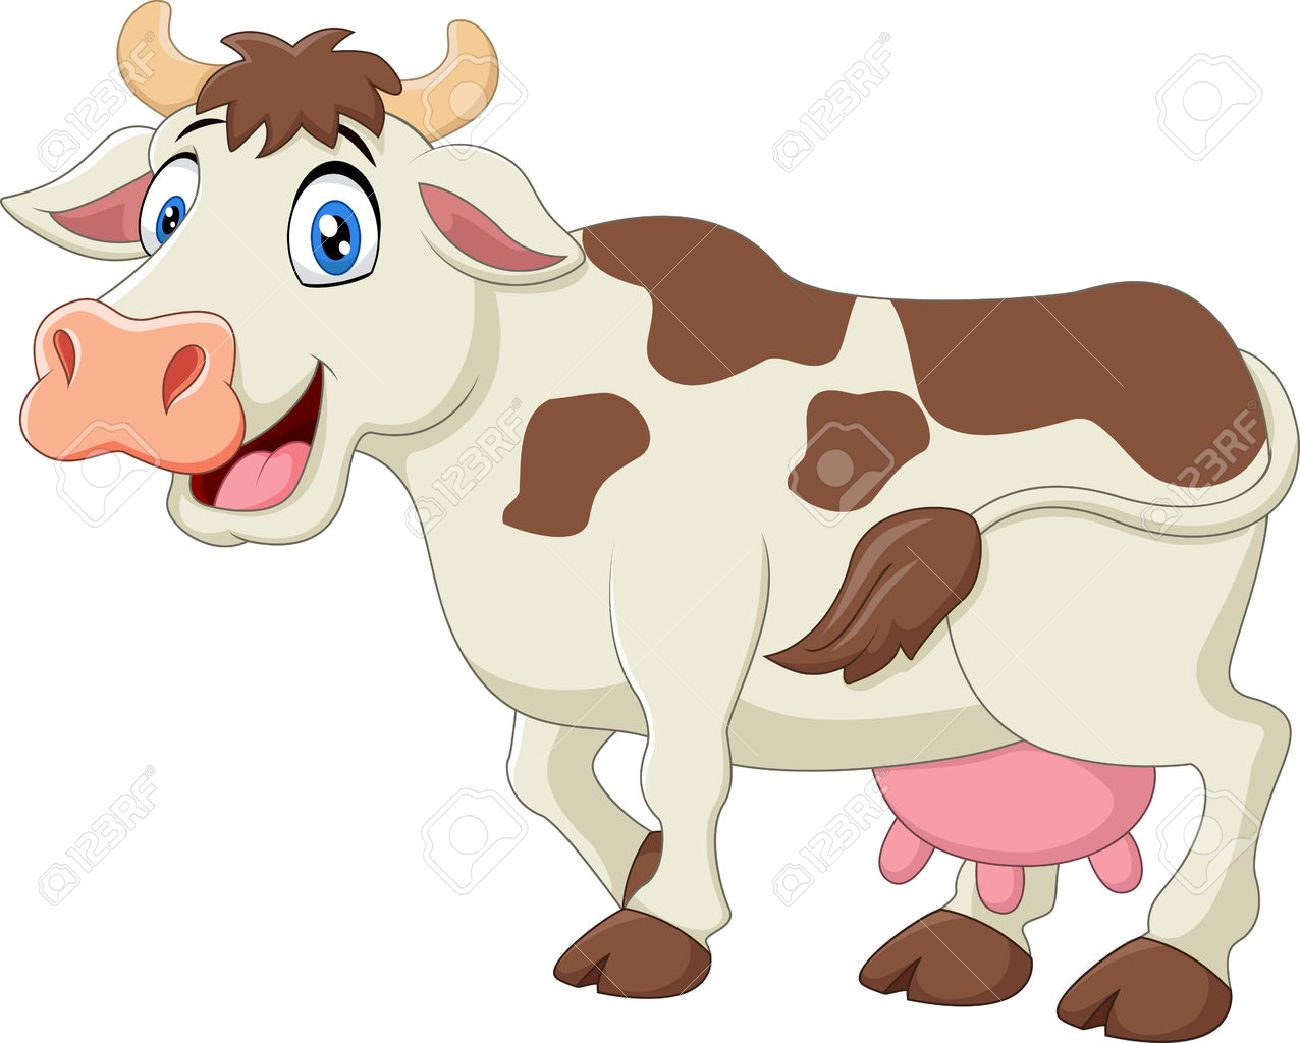 cute cow cartoon royalty free cliparts vectors and stock rh 123rf com cow images cartoon black and white cow cartoon images free download